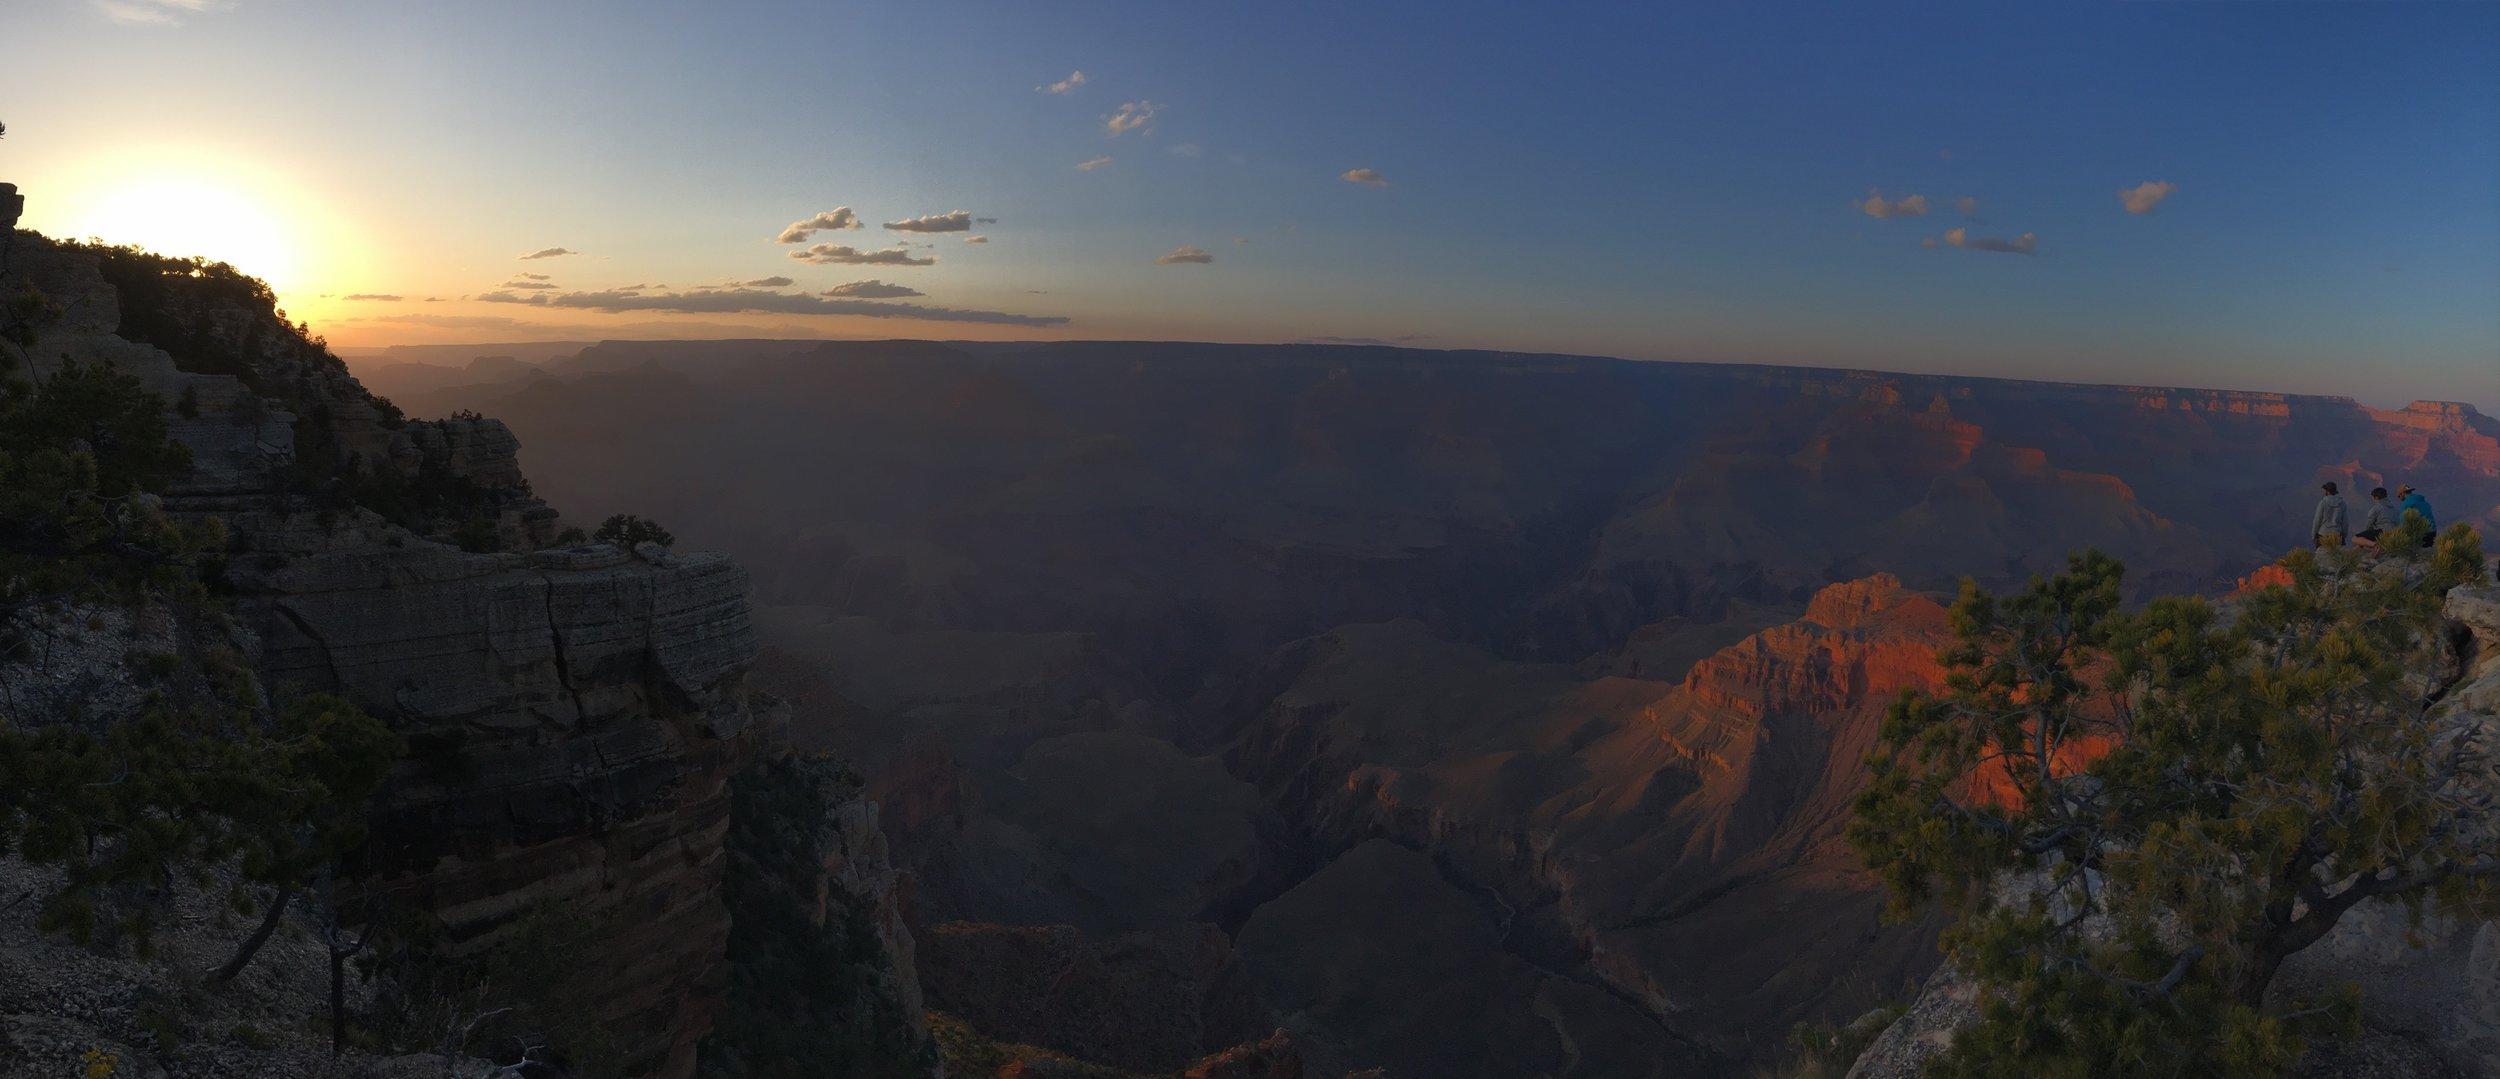 Alexander is pretty darn good at panoramas.